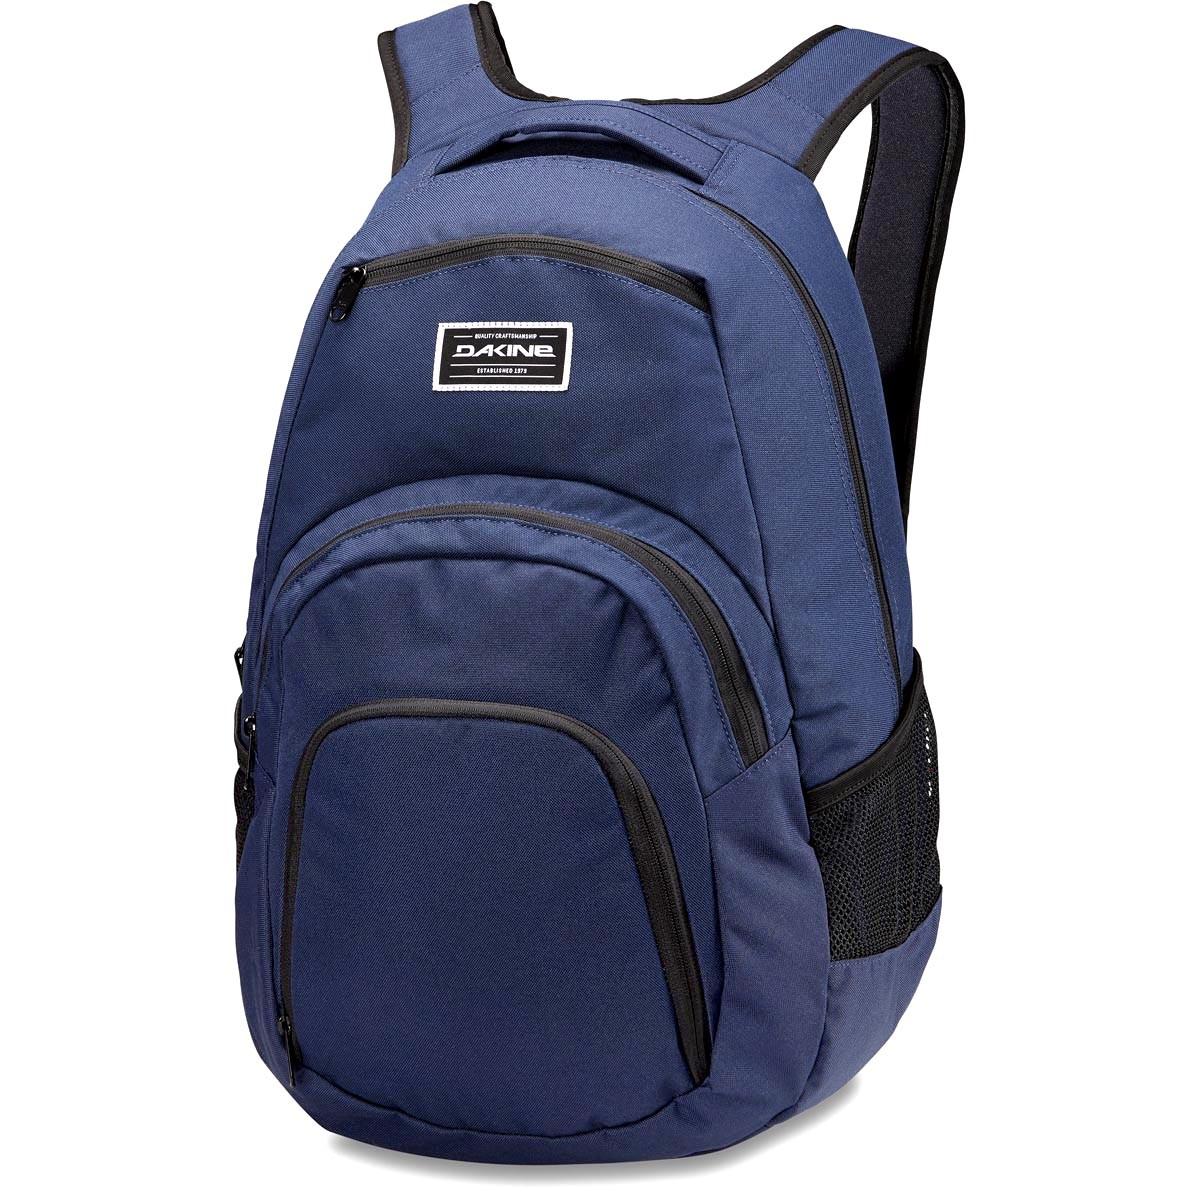 336bf13507e7e Dakine Campus 33L Backpack Dark Navy